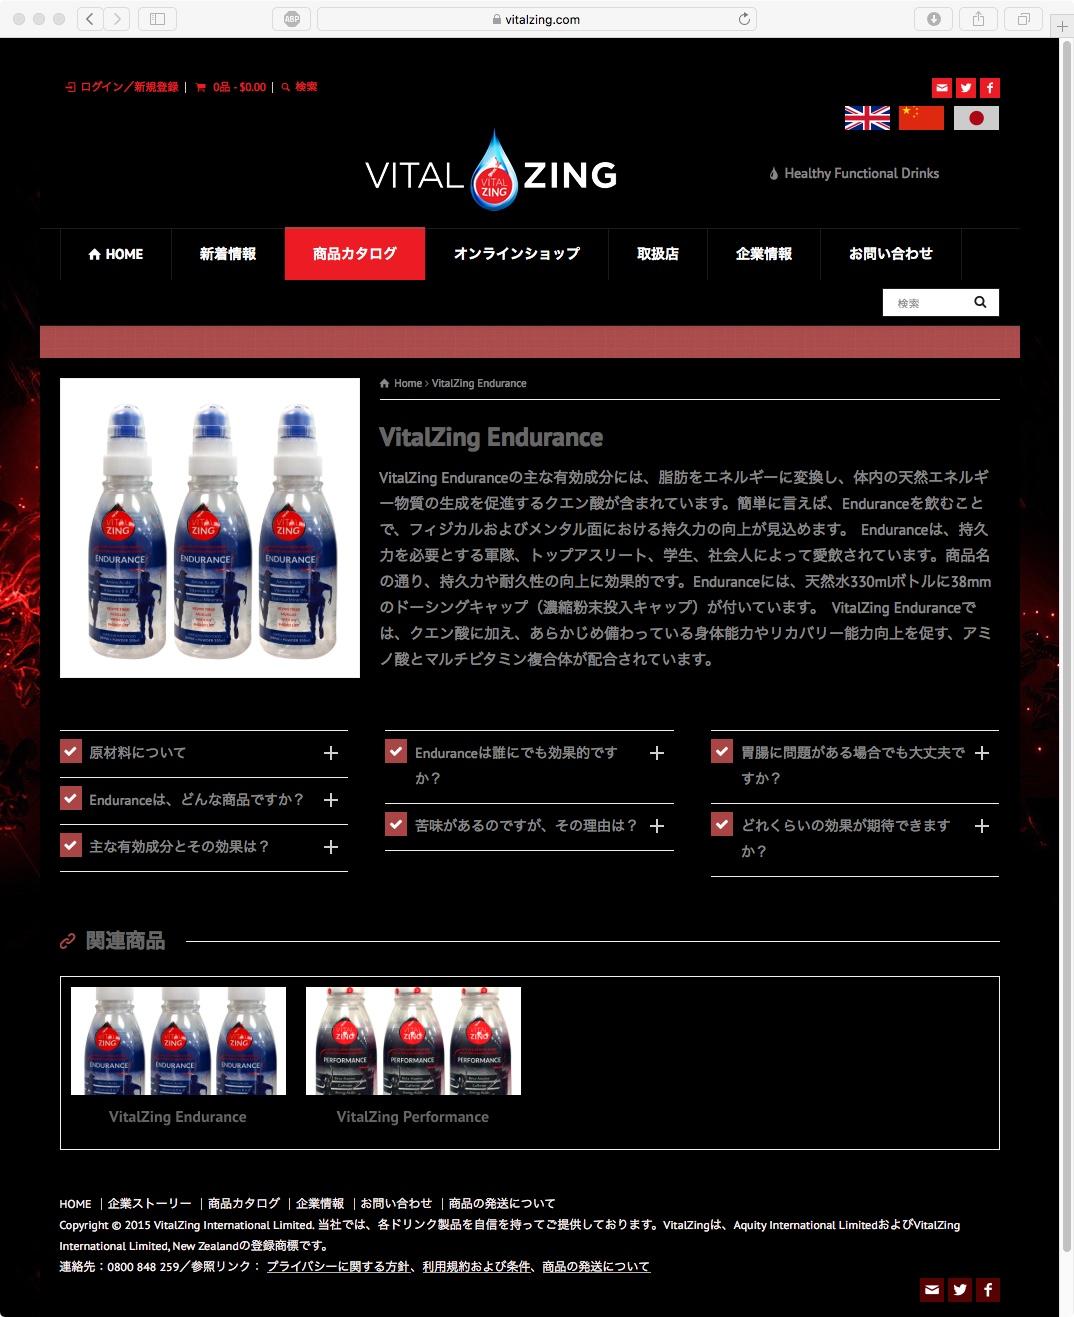 vitalzing_web